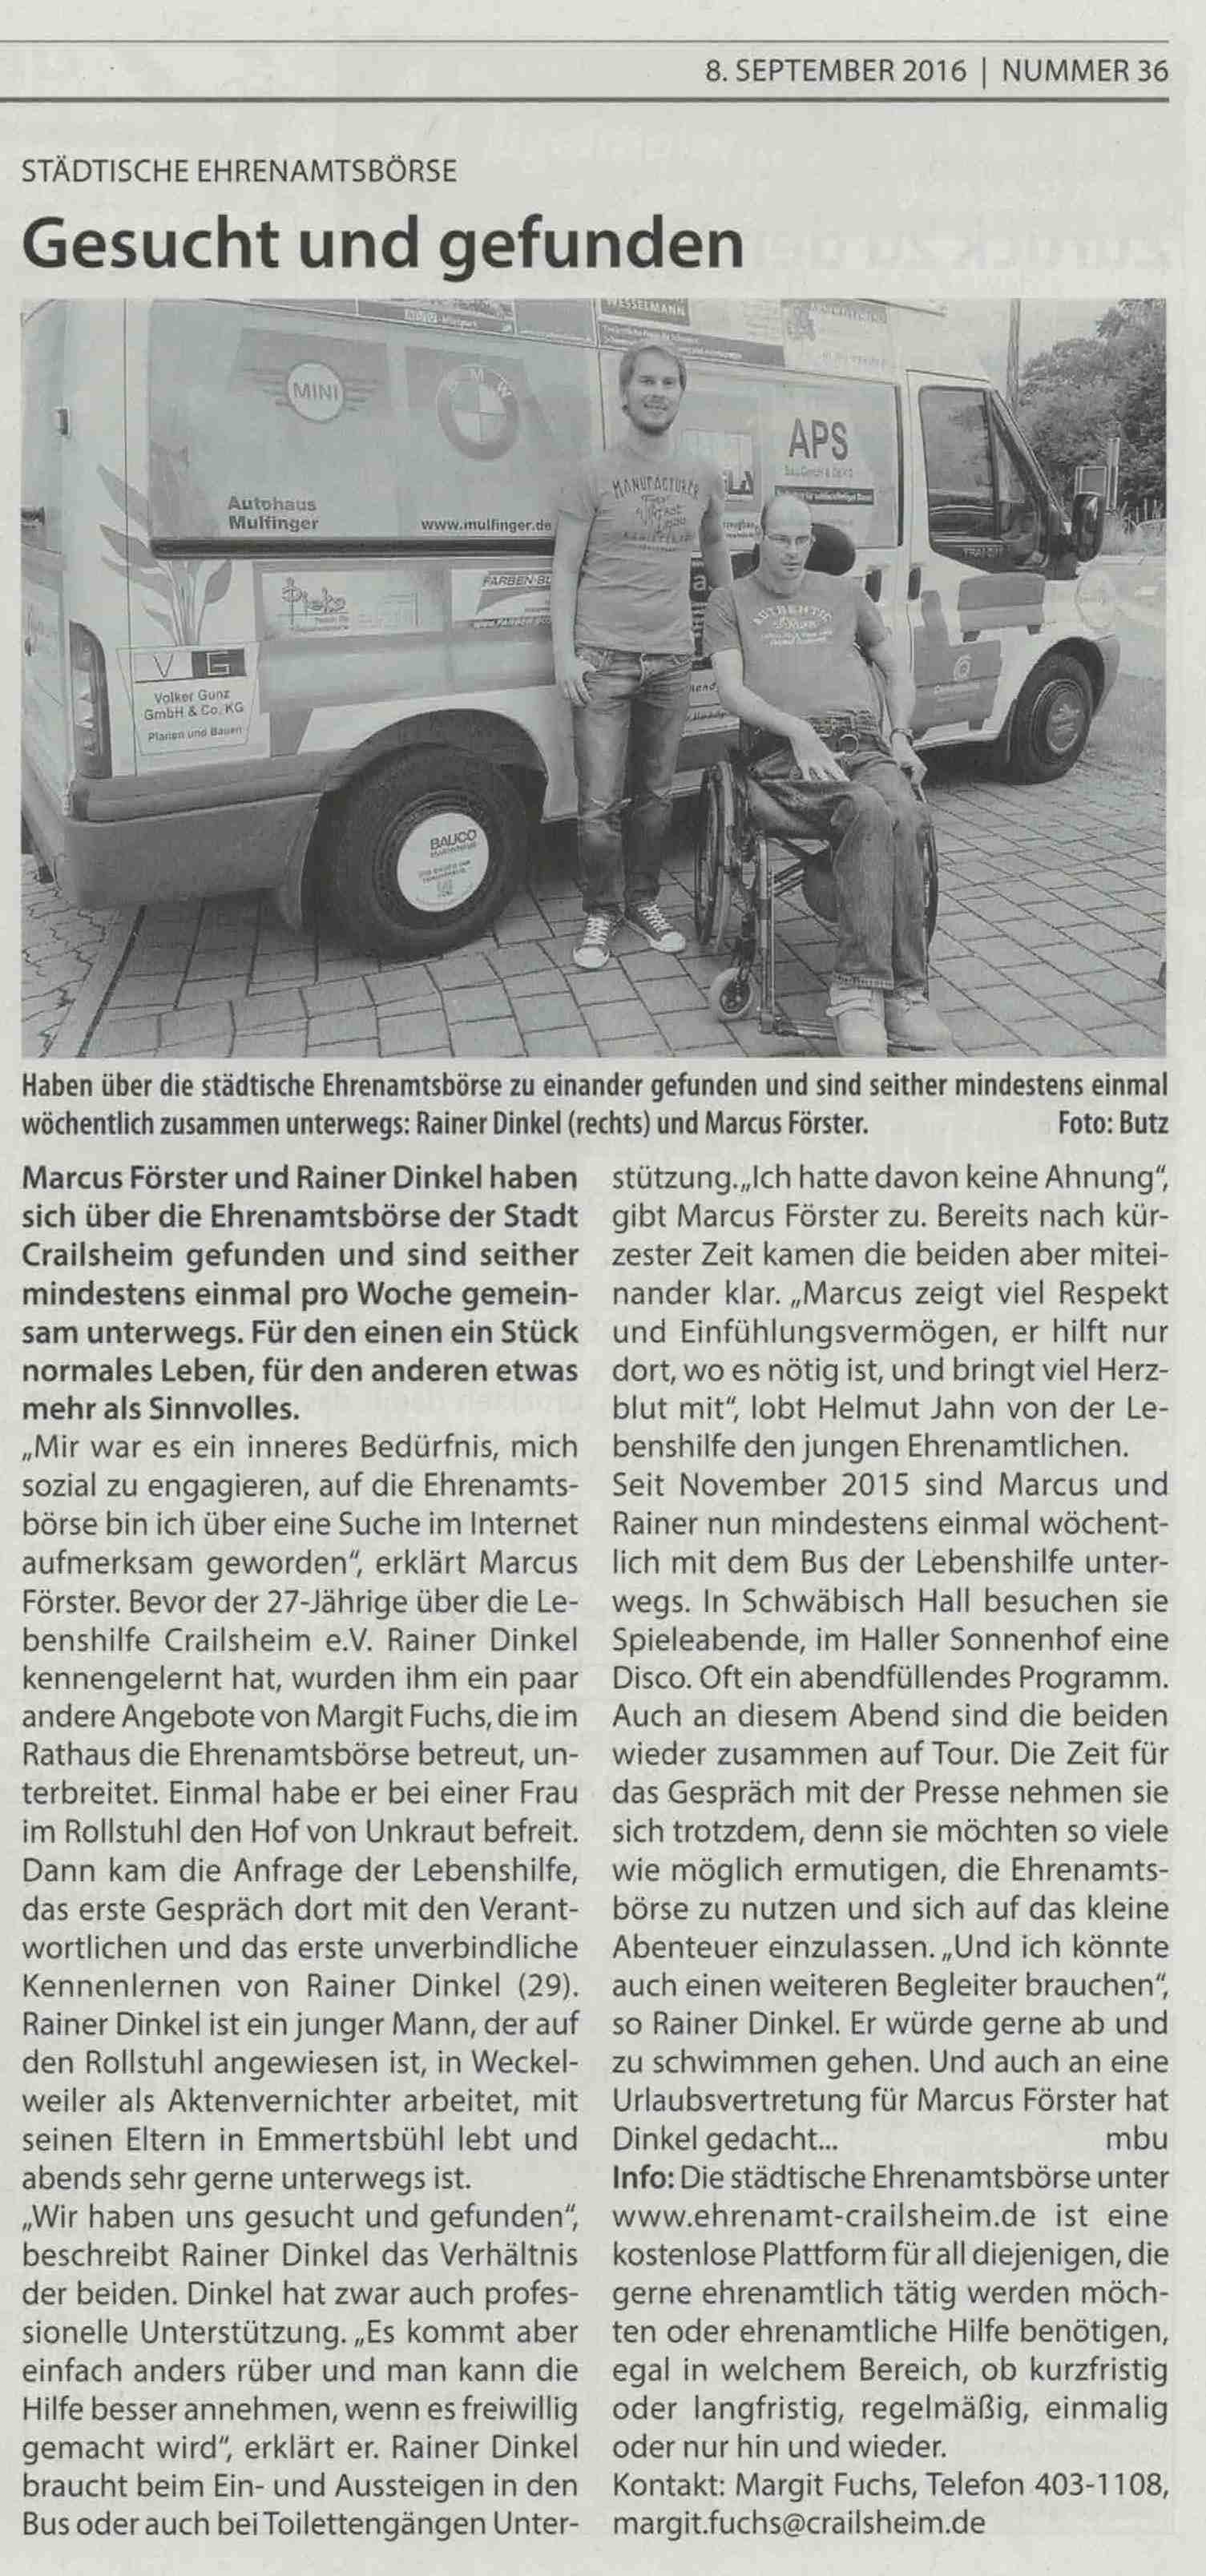 Ehrenamt Markus Frster-2.jpg - 317.80 KB